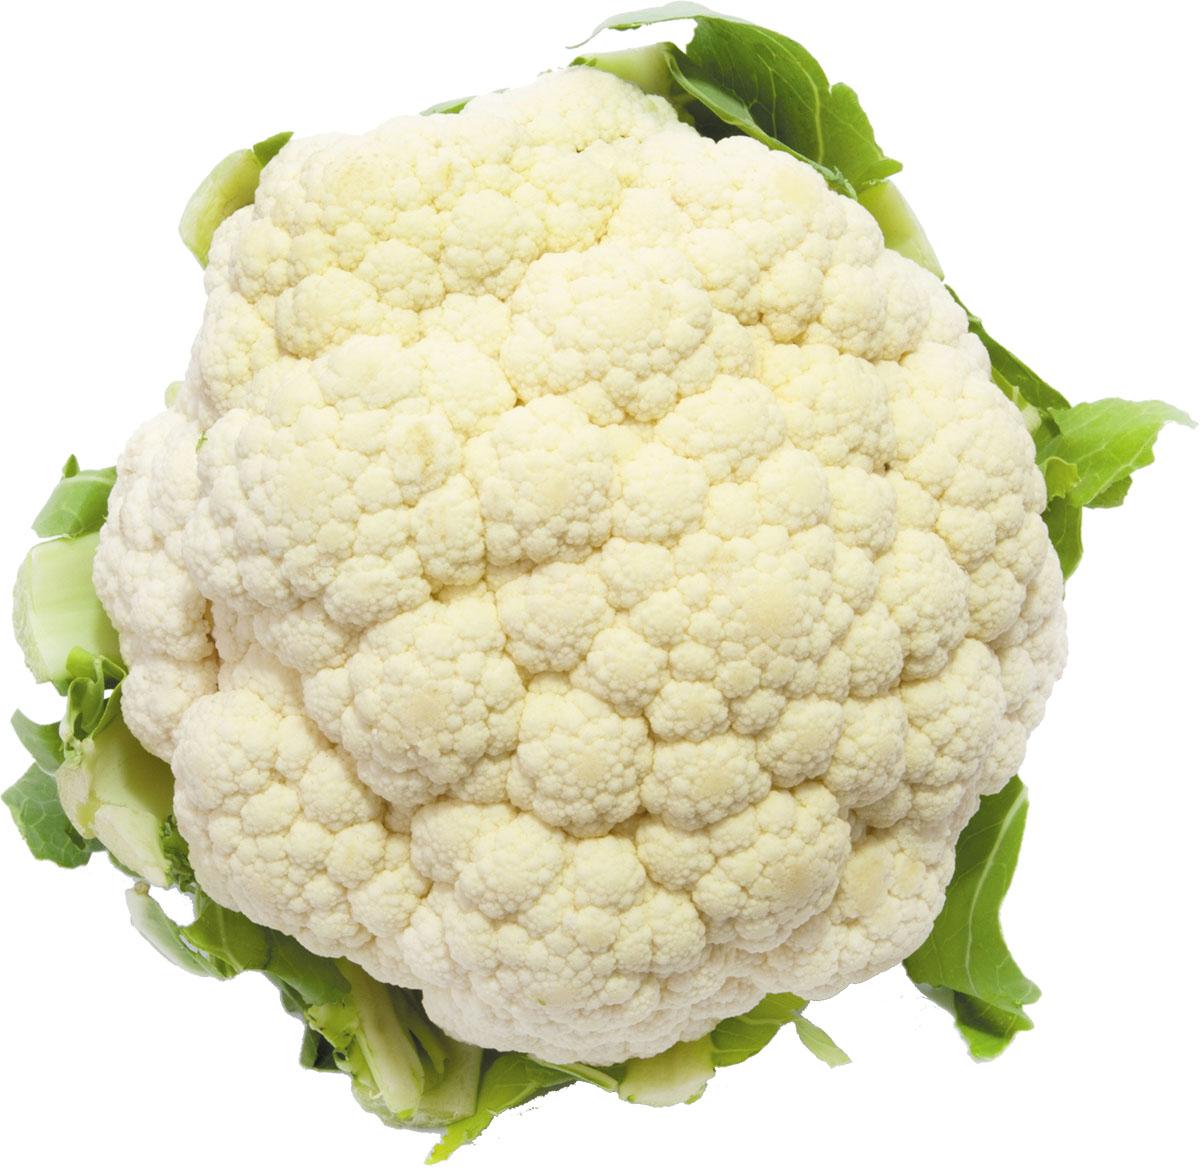 Head of fresh cauliflower on a white background.